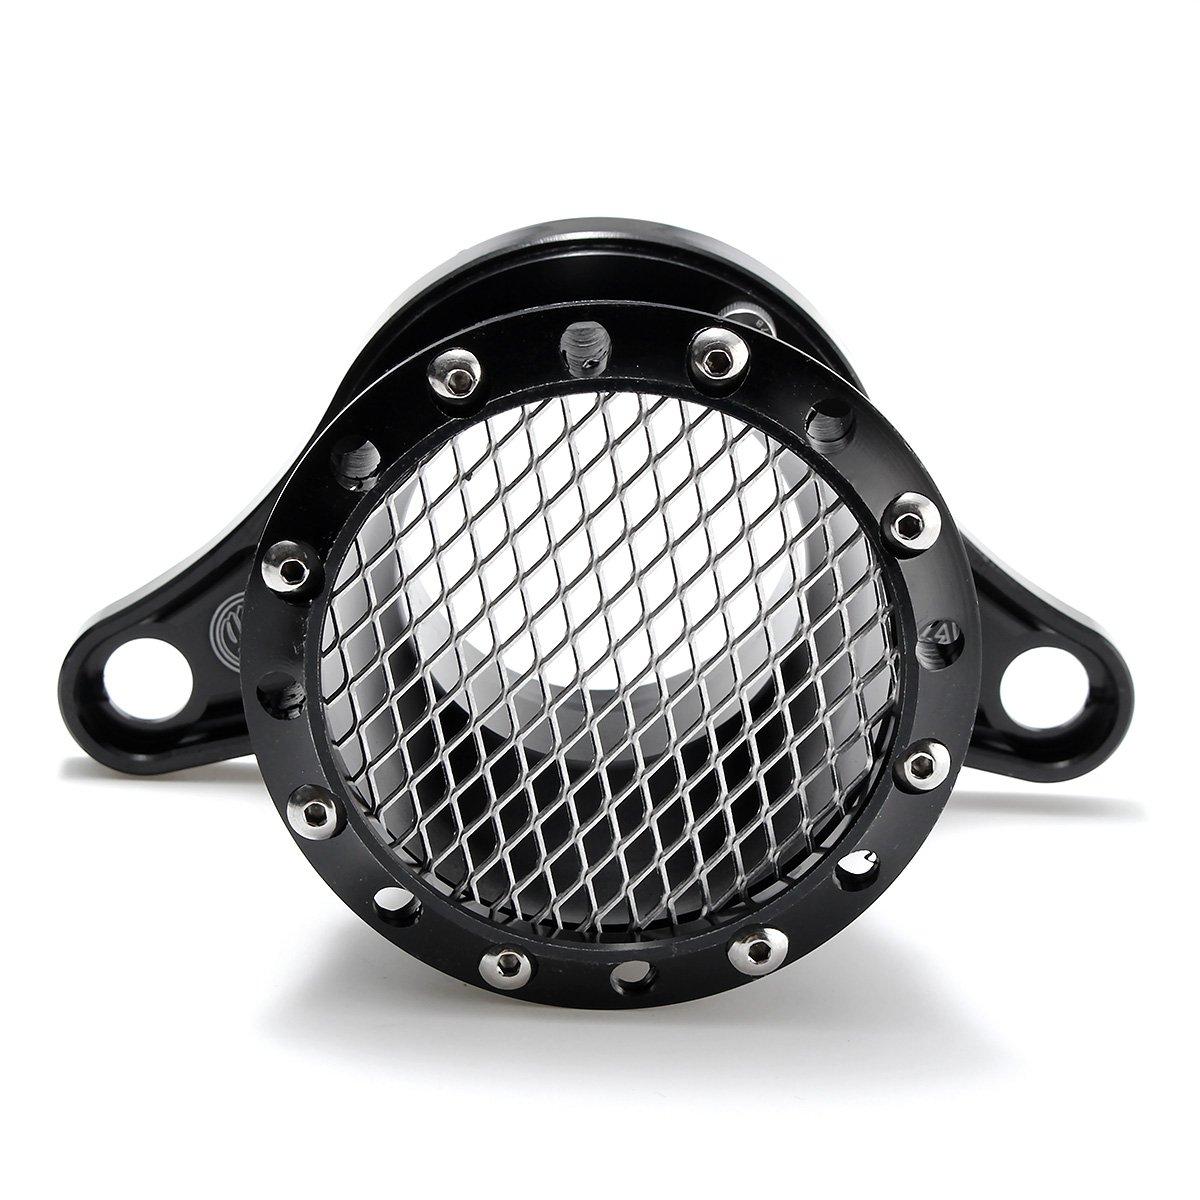 Wooya Filtro Aspirazione Aria Per Harley Touring Sportster xl 1200 883 48 2004-Up